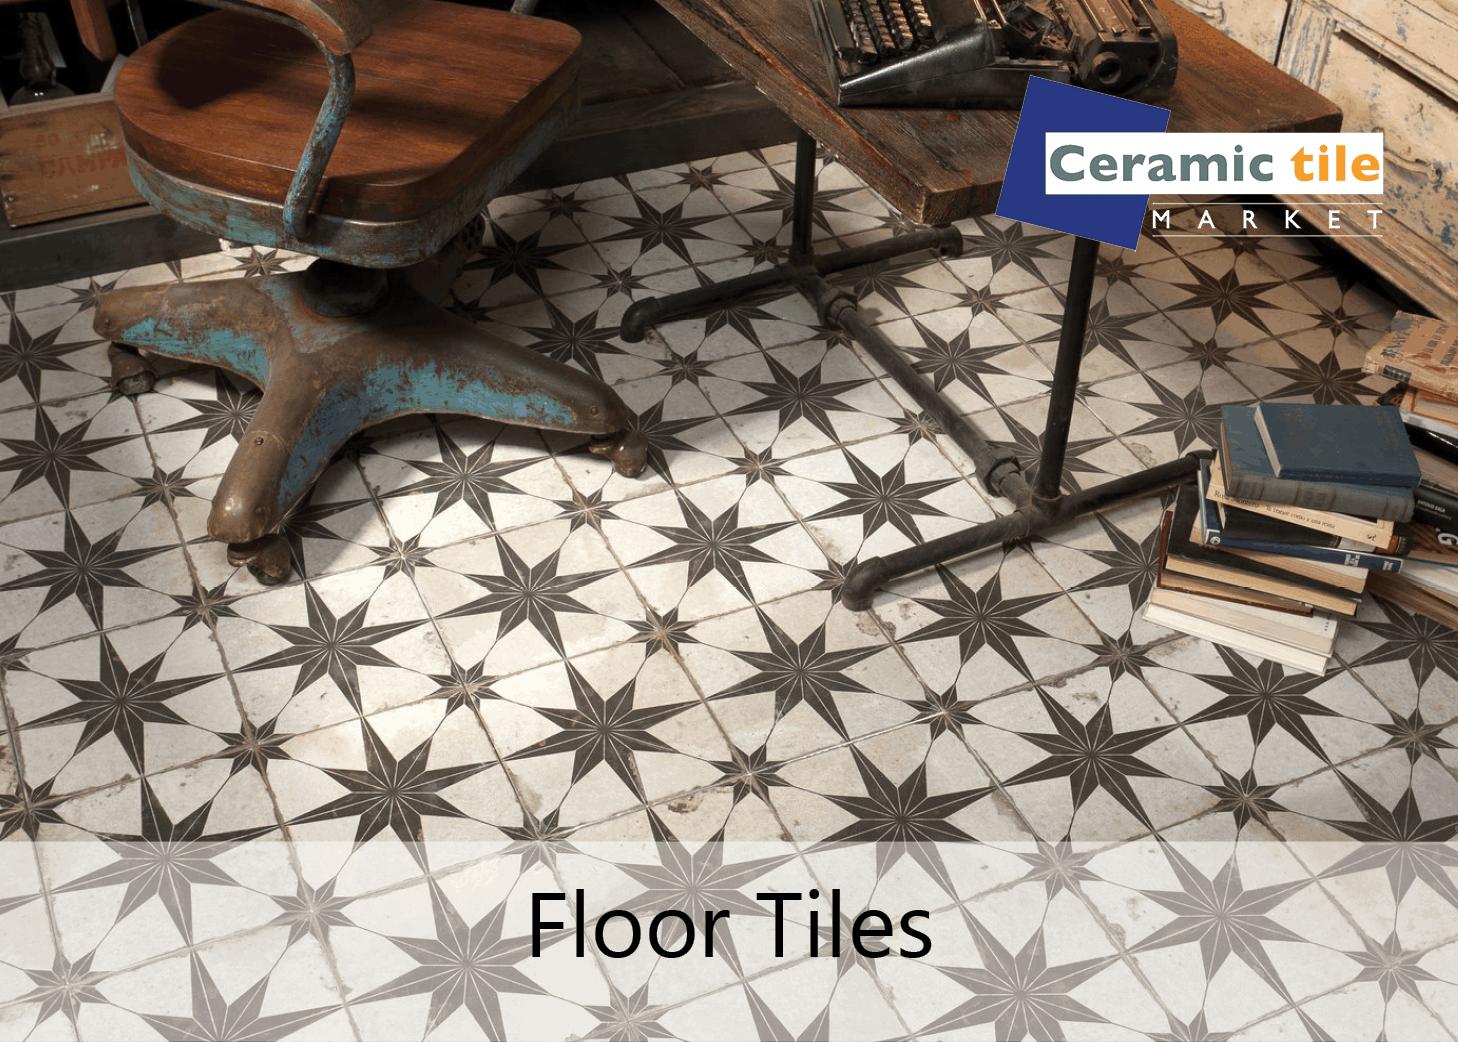 emc tiles future star peronda floor tiles patterned tiling